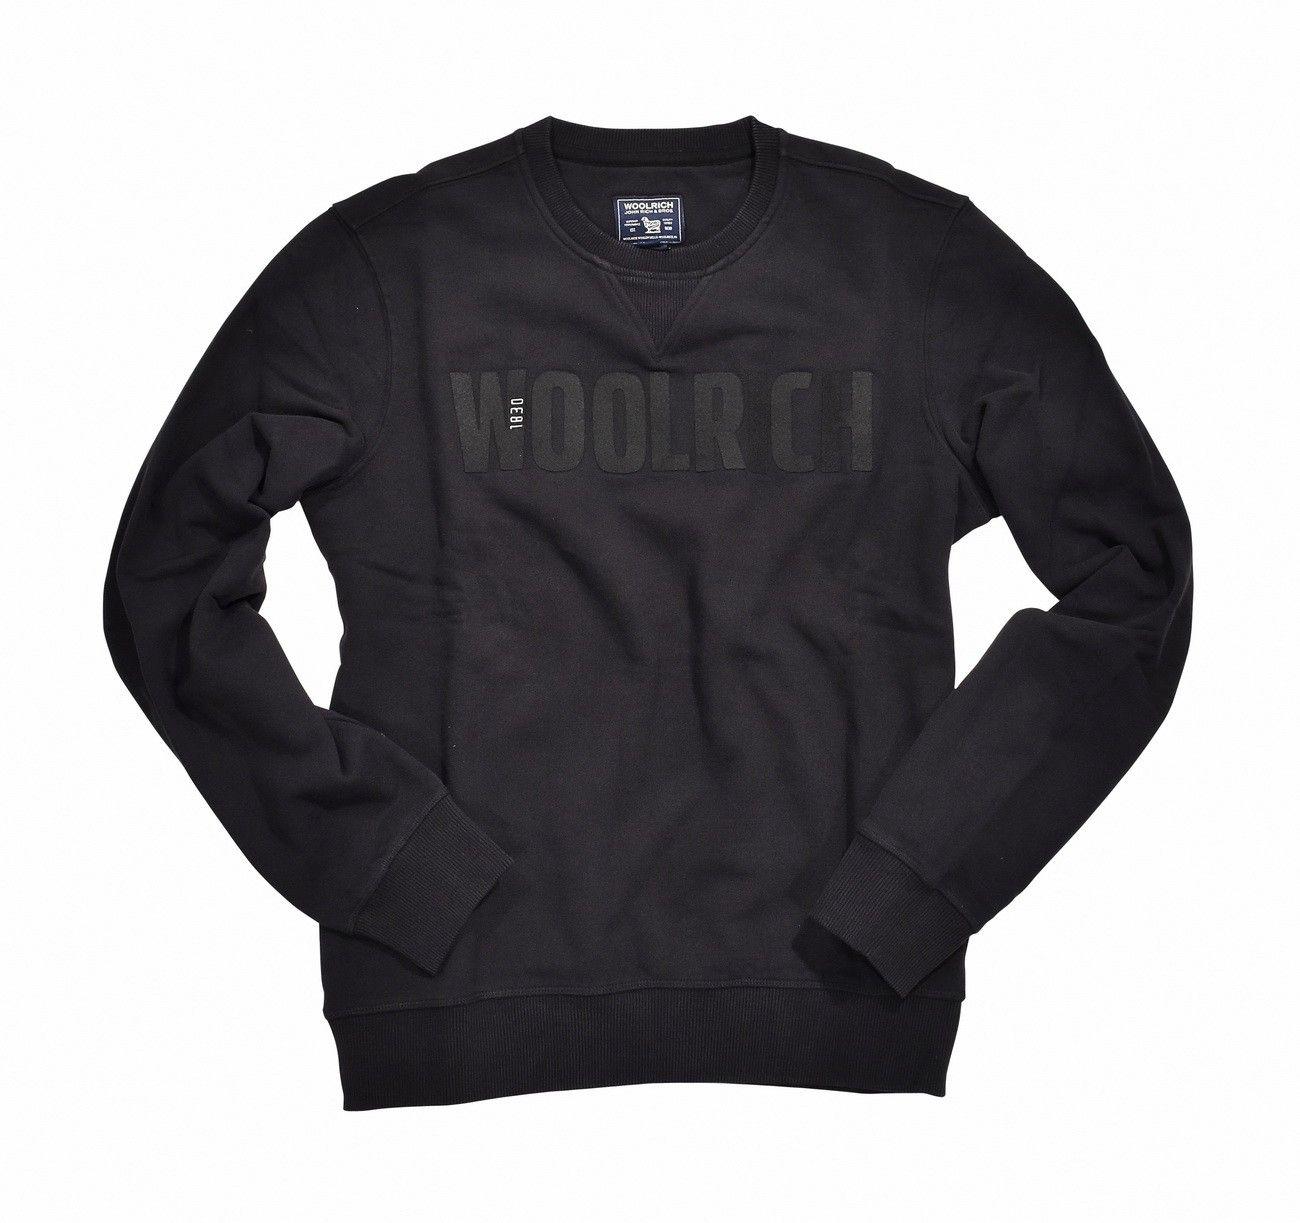 WOOLRICH - Herren Pullover - Brushed Crew Neck - Black